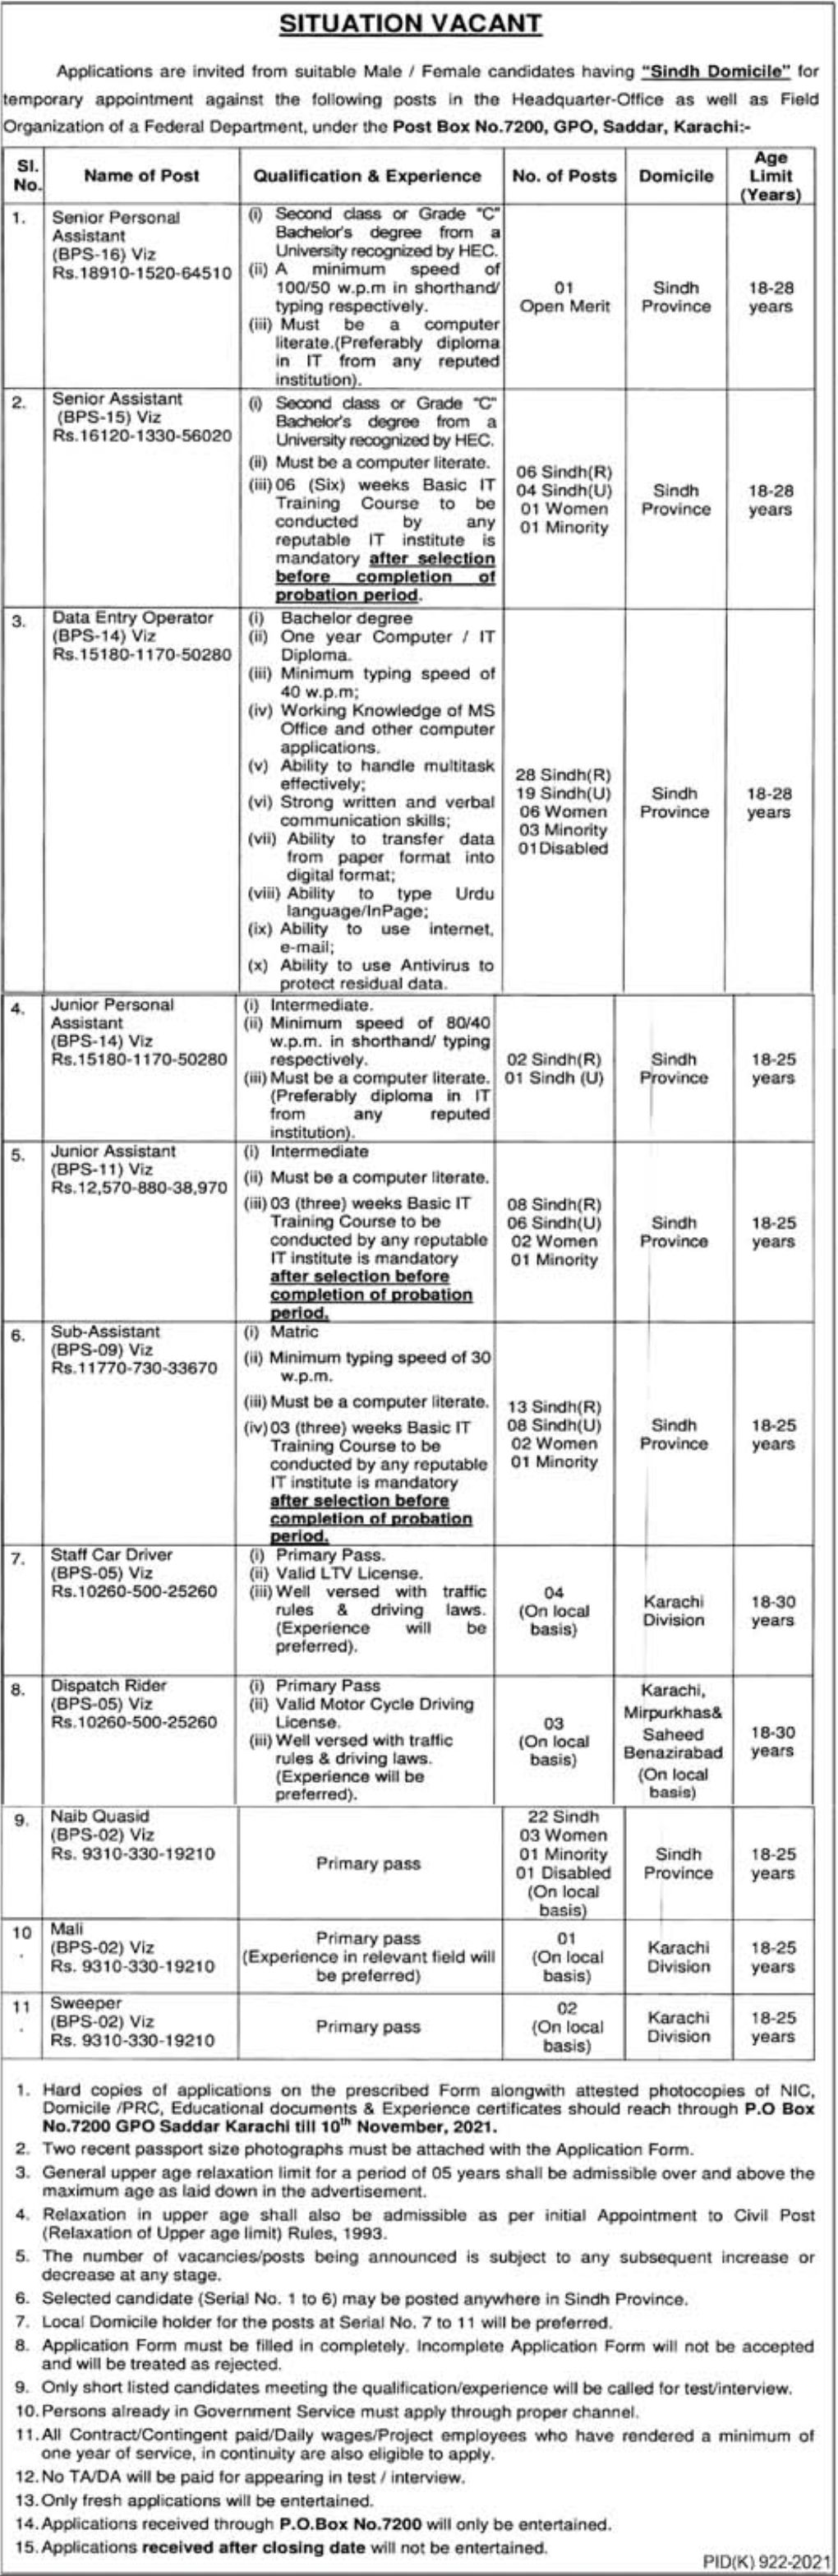 Post Box No.7200 GPO Saddar Karachi Vacancies 2021 – Latest Jobs 3